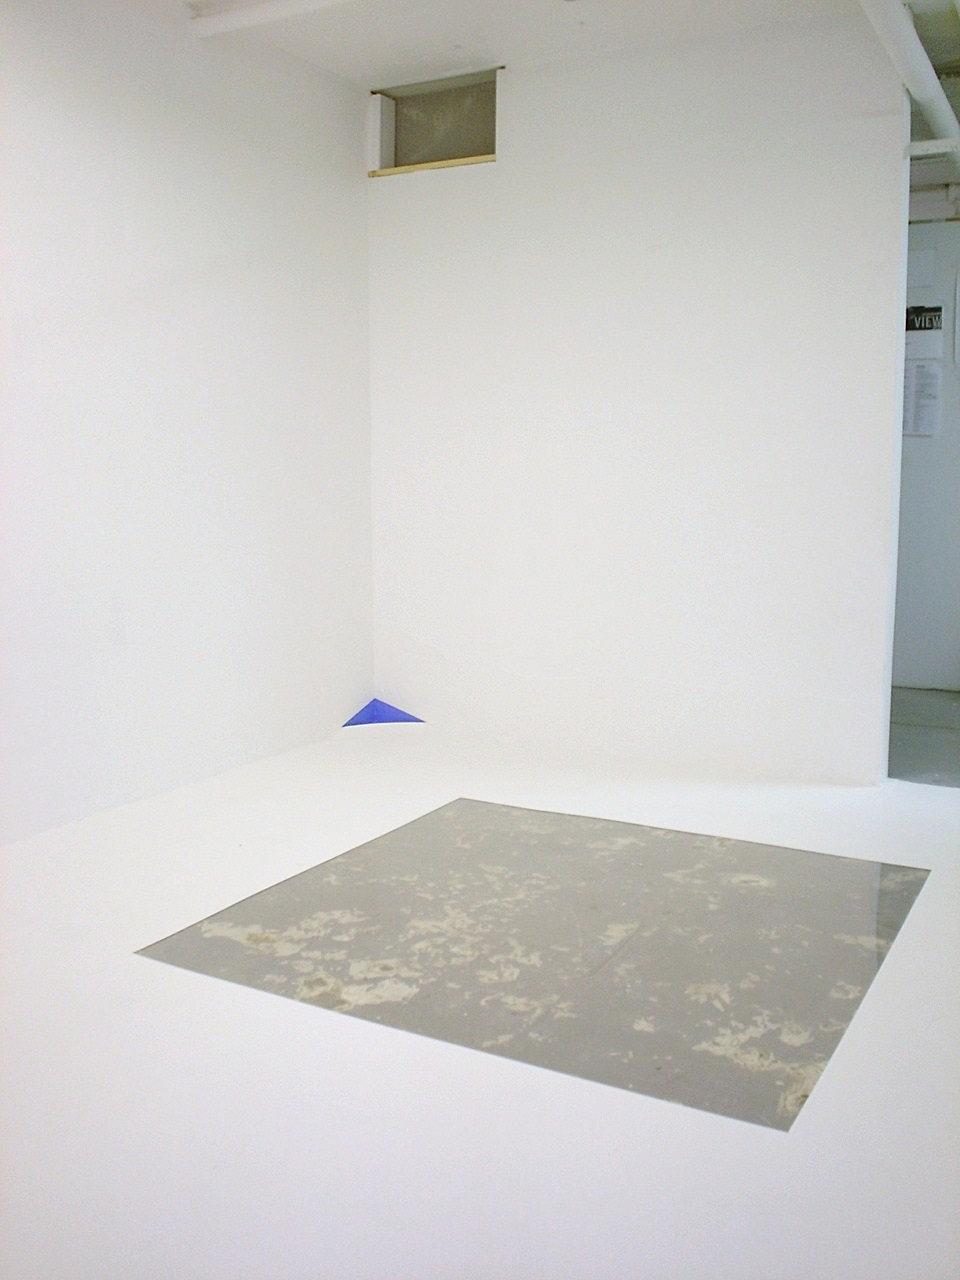 plexiglass floor inlay, corner modification/pocket and wall inset, Summer 2007